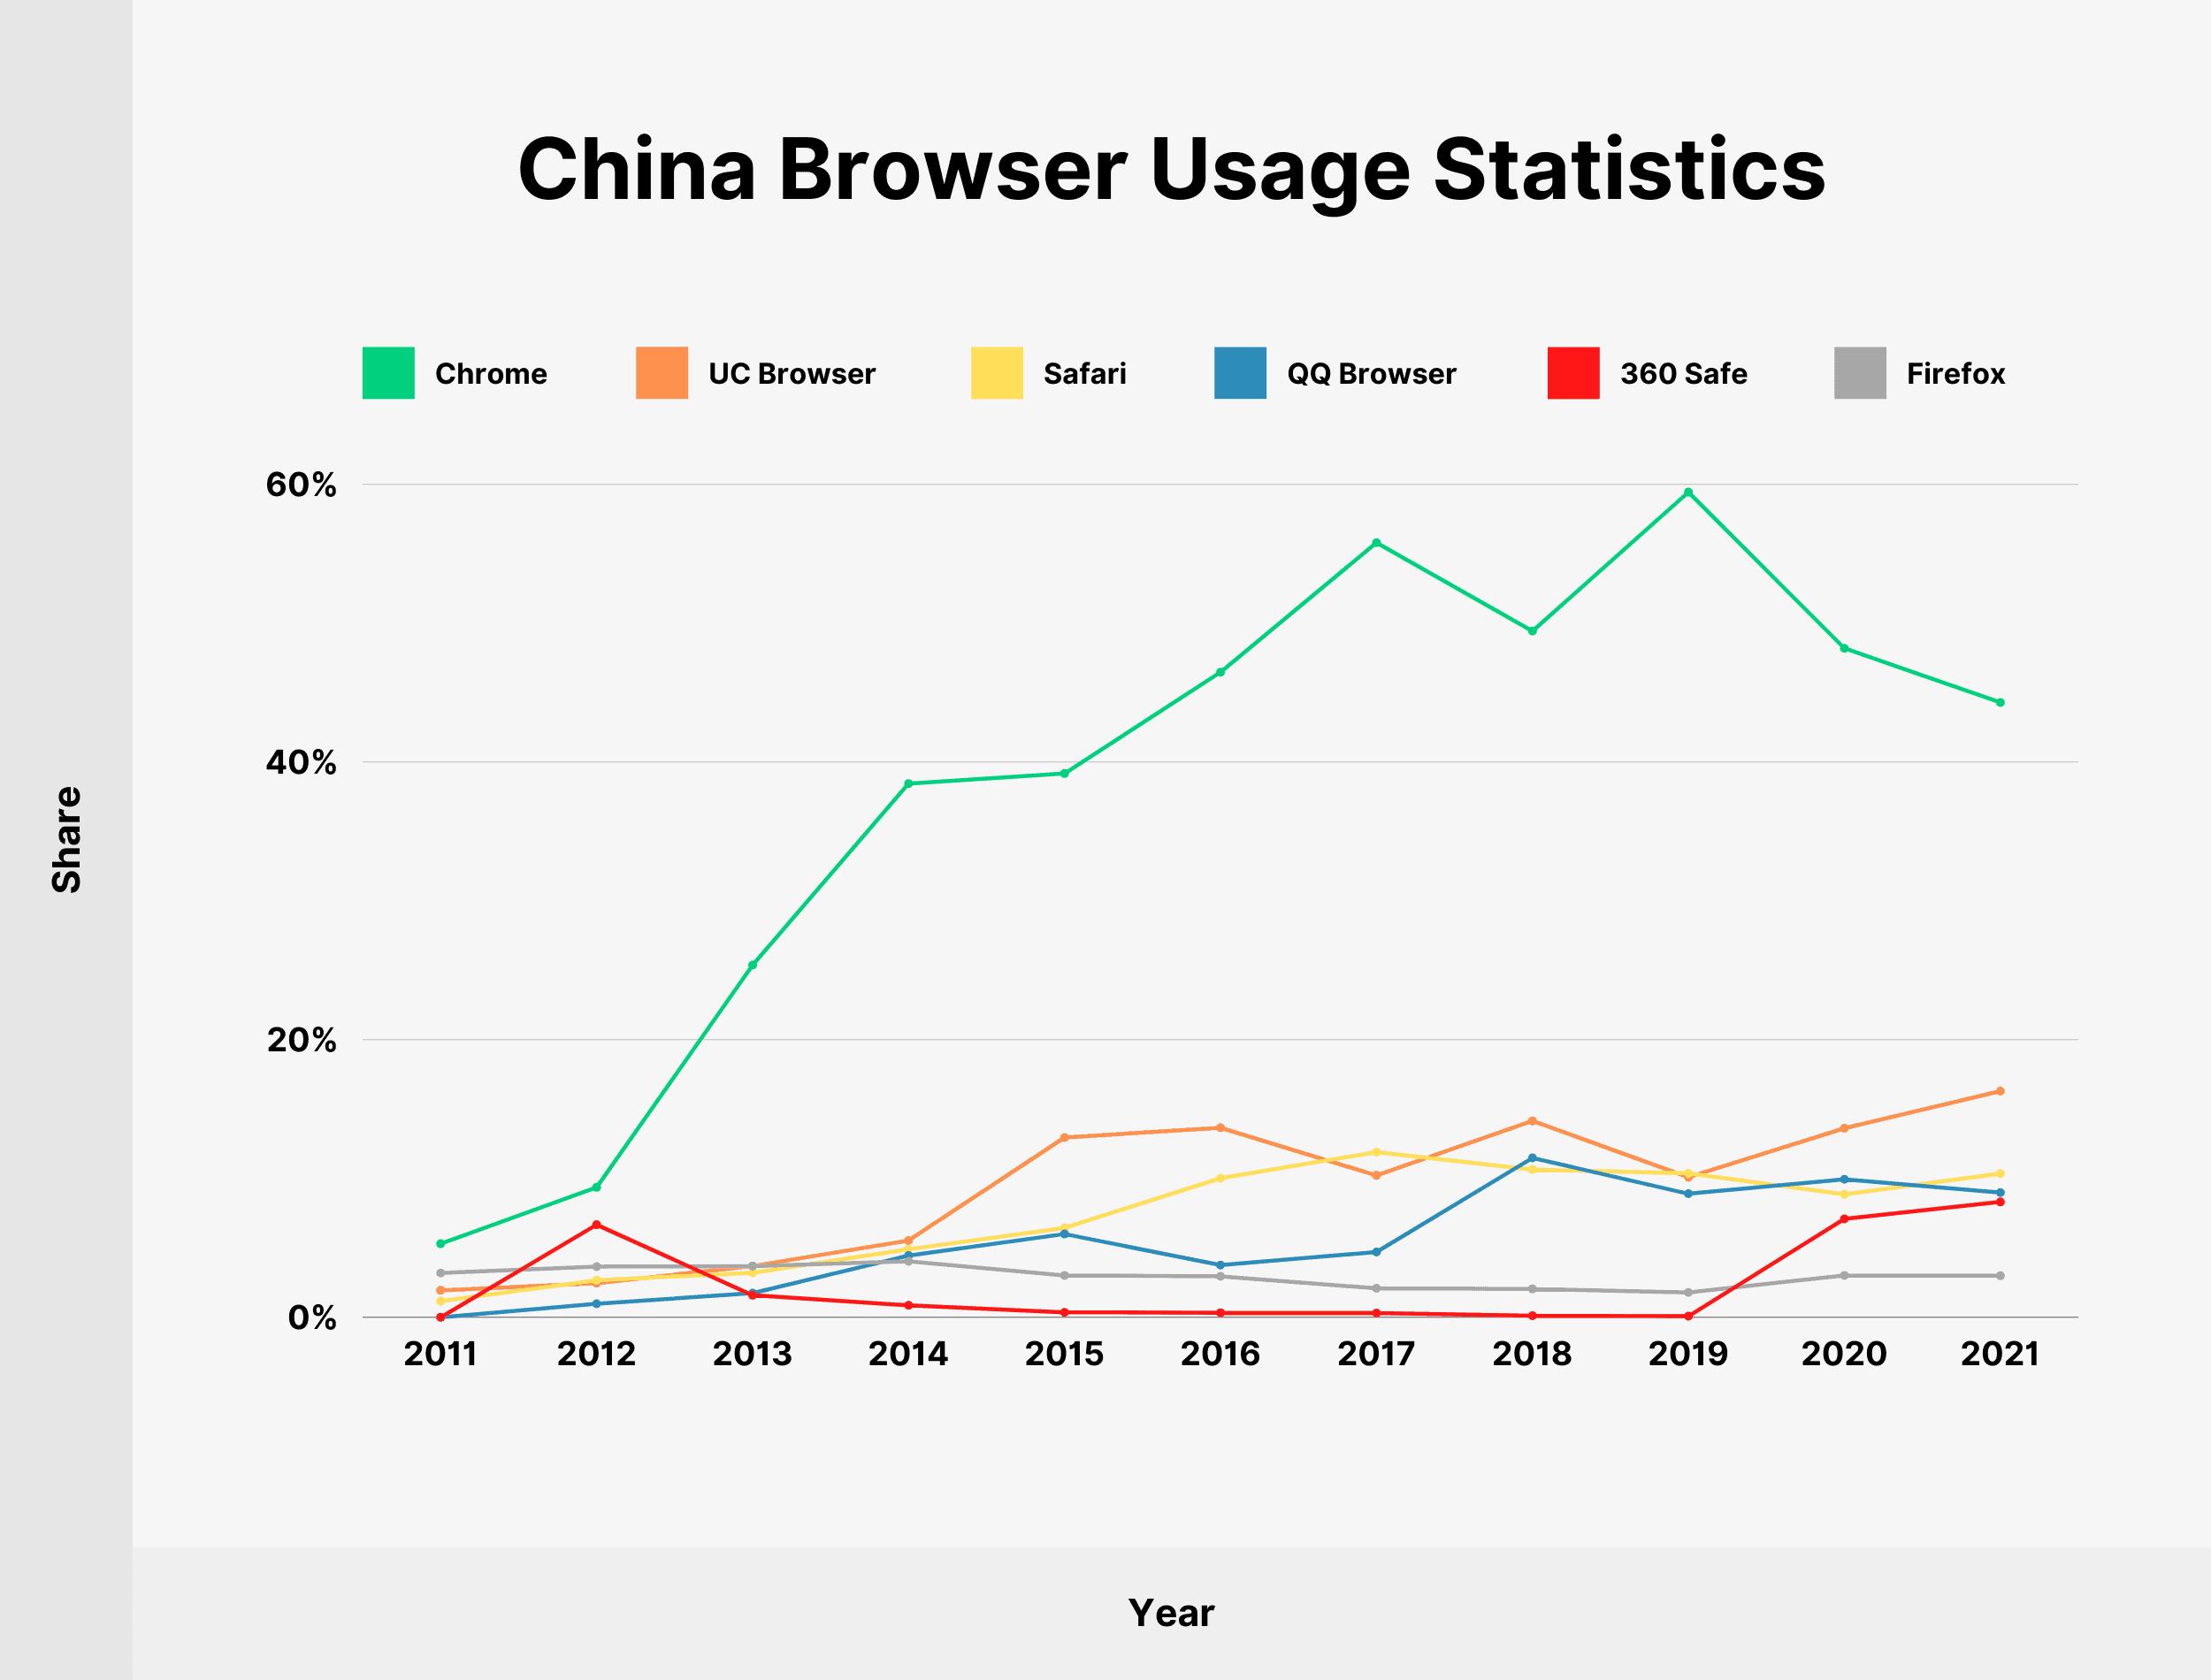 China Browser Usage Statistics